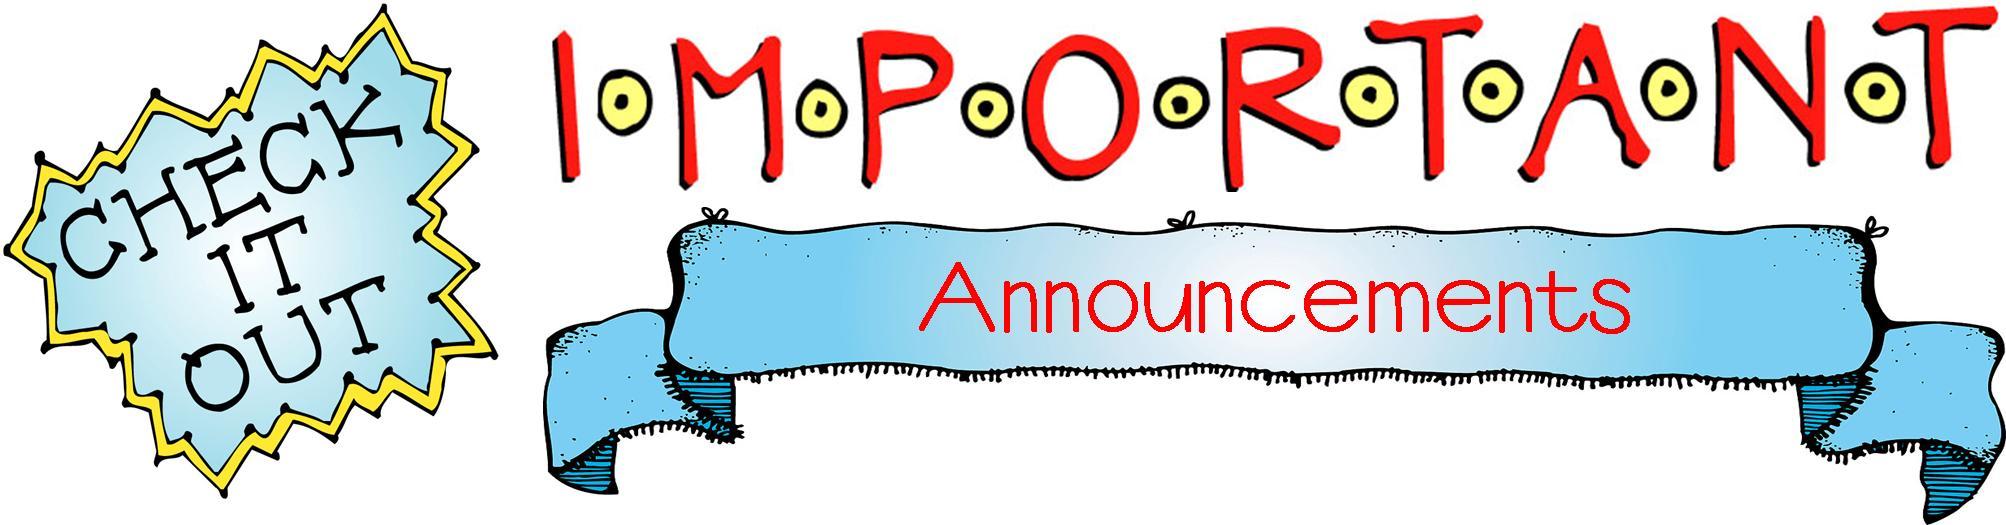 Announcement Clip Art